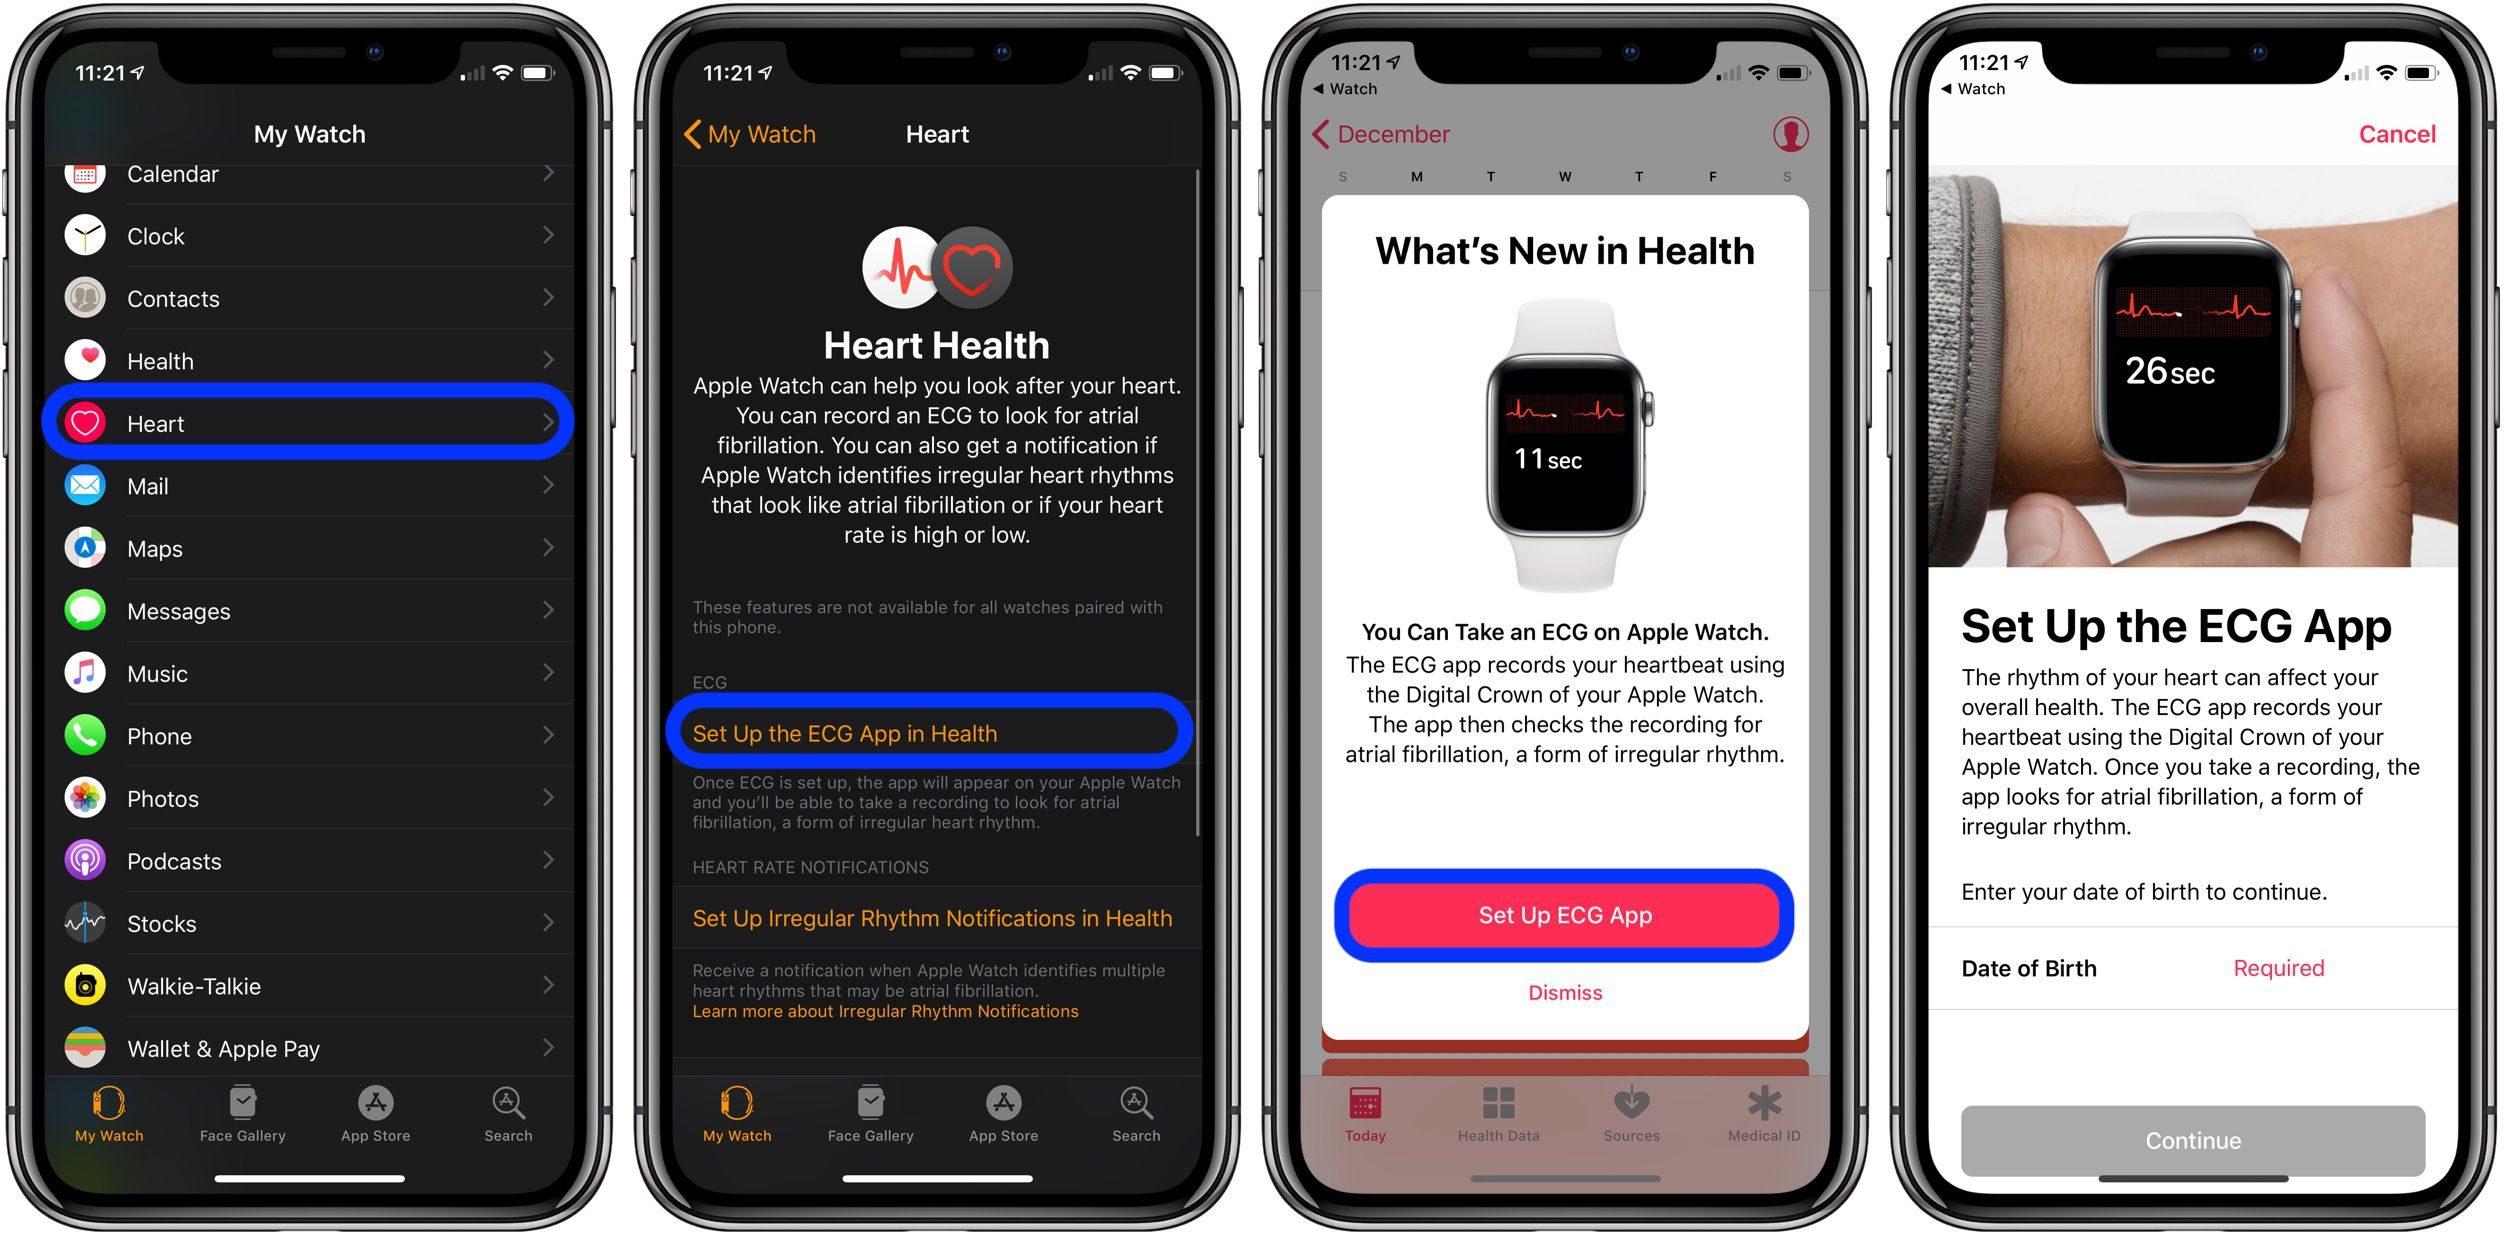 "<span href=""https://9to5mac.com/2018/12/06/take-ecg-ekg-electrocardiogram-apple-watch/"">Cómo tomar un ECG (electrocardiograma) en el Apple Watch [Galería]</a>"